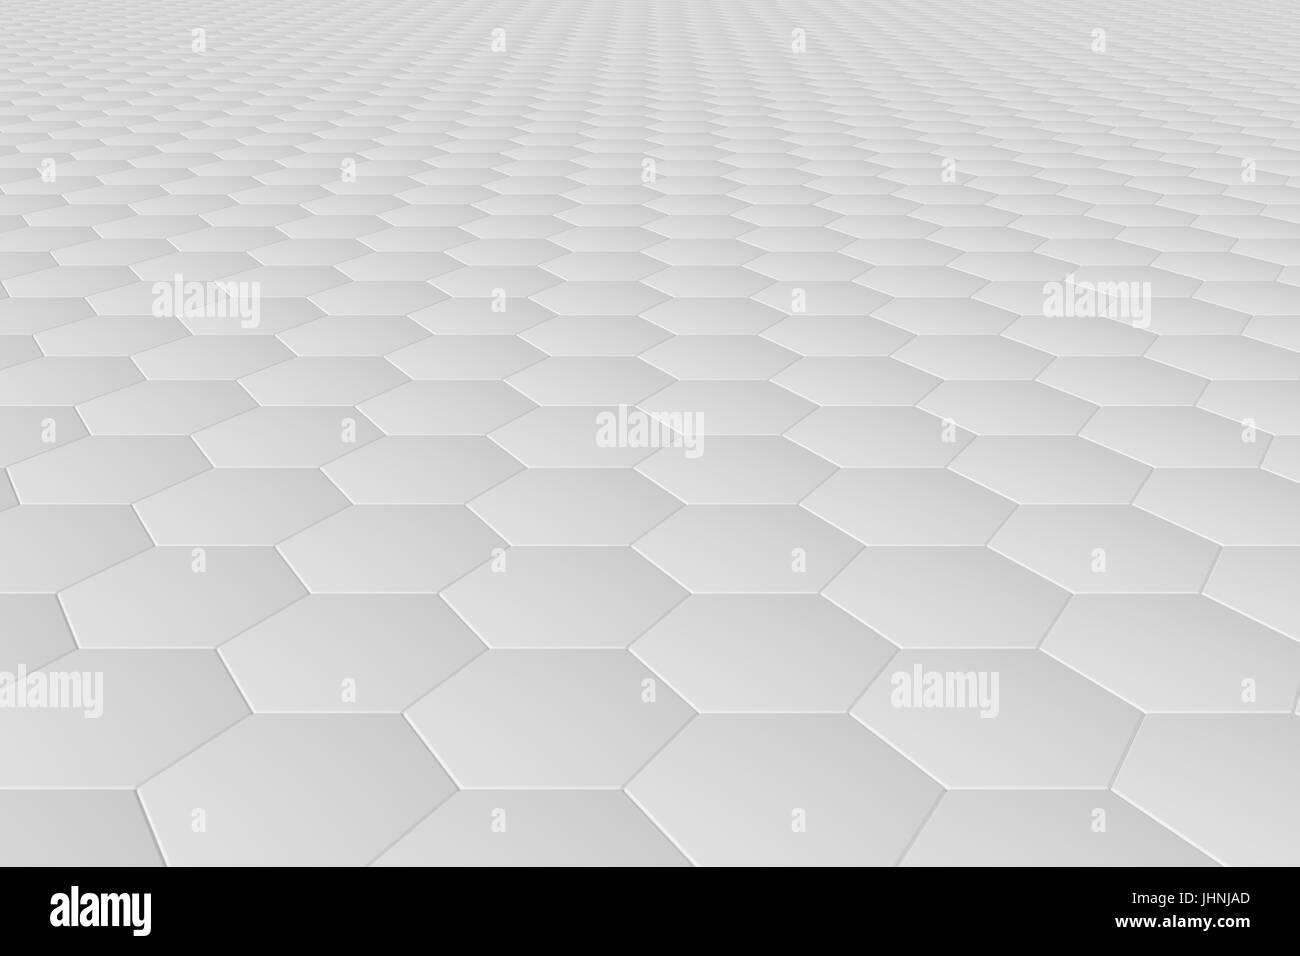 White monochrome hexagon tiles abstract background - Stock Image